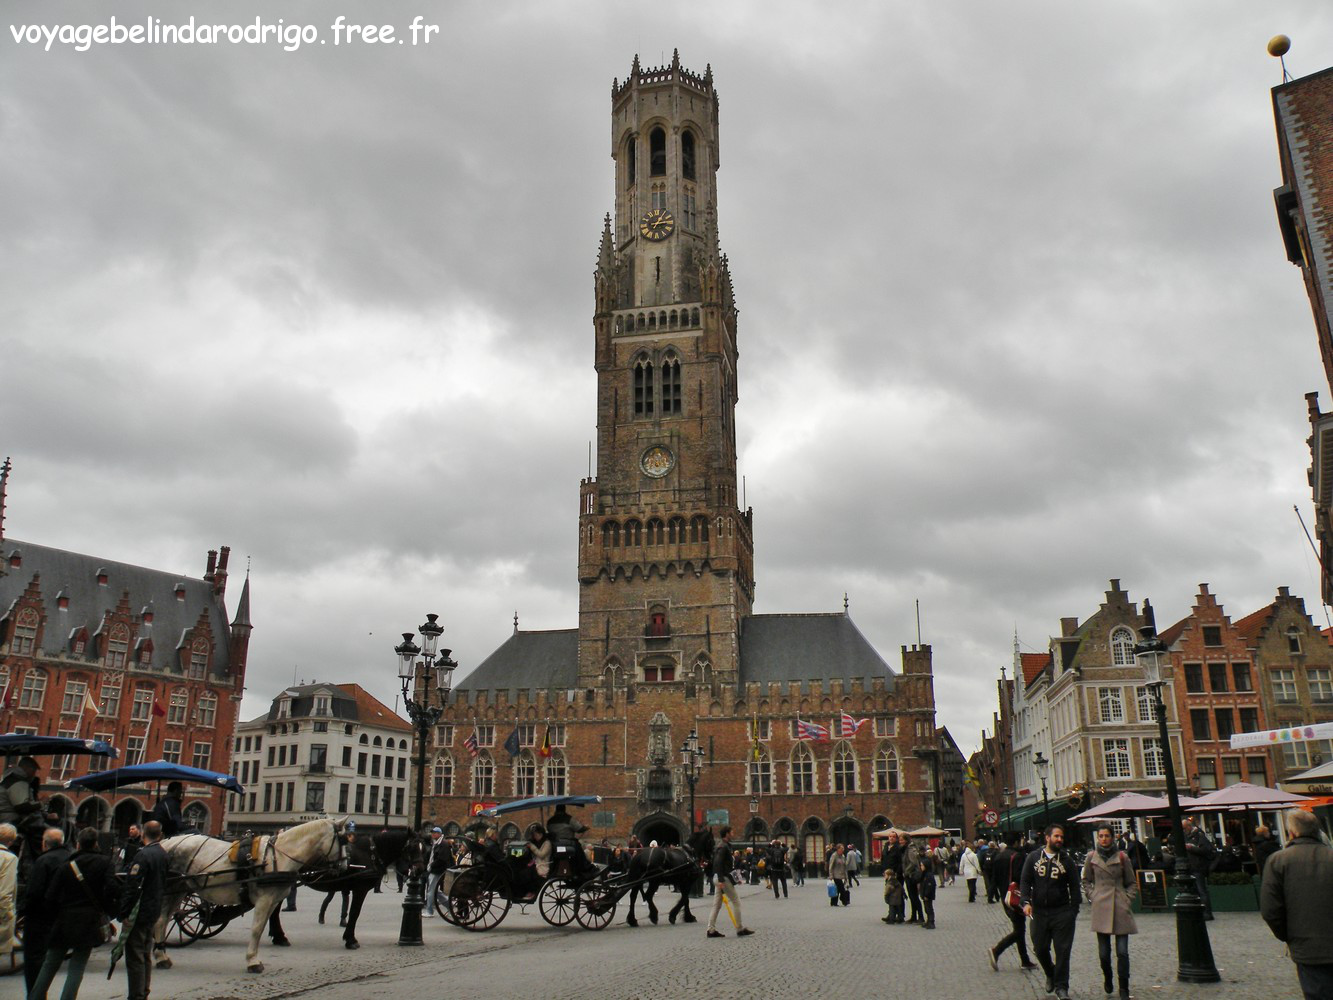 Beffroi - Place du Markt - Bruges